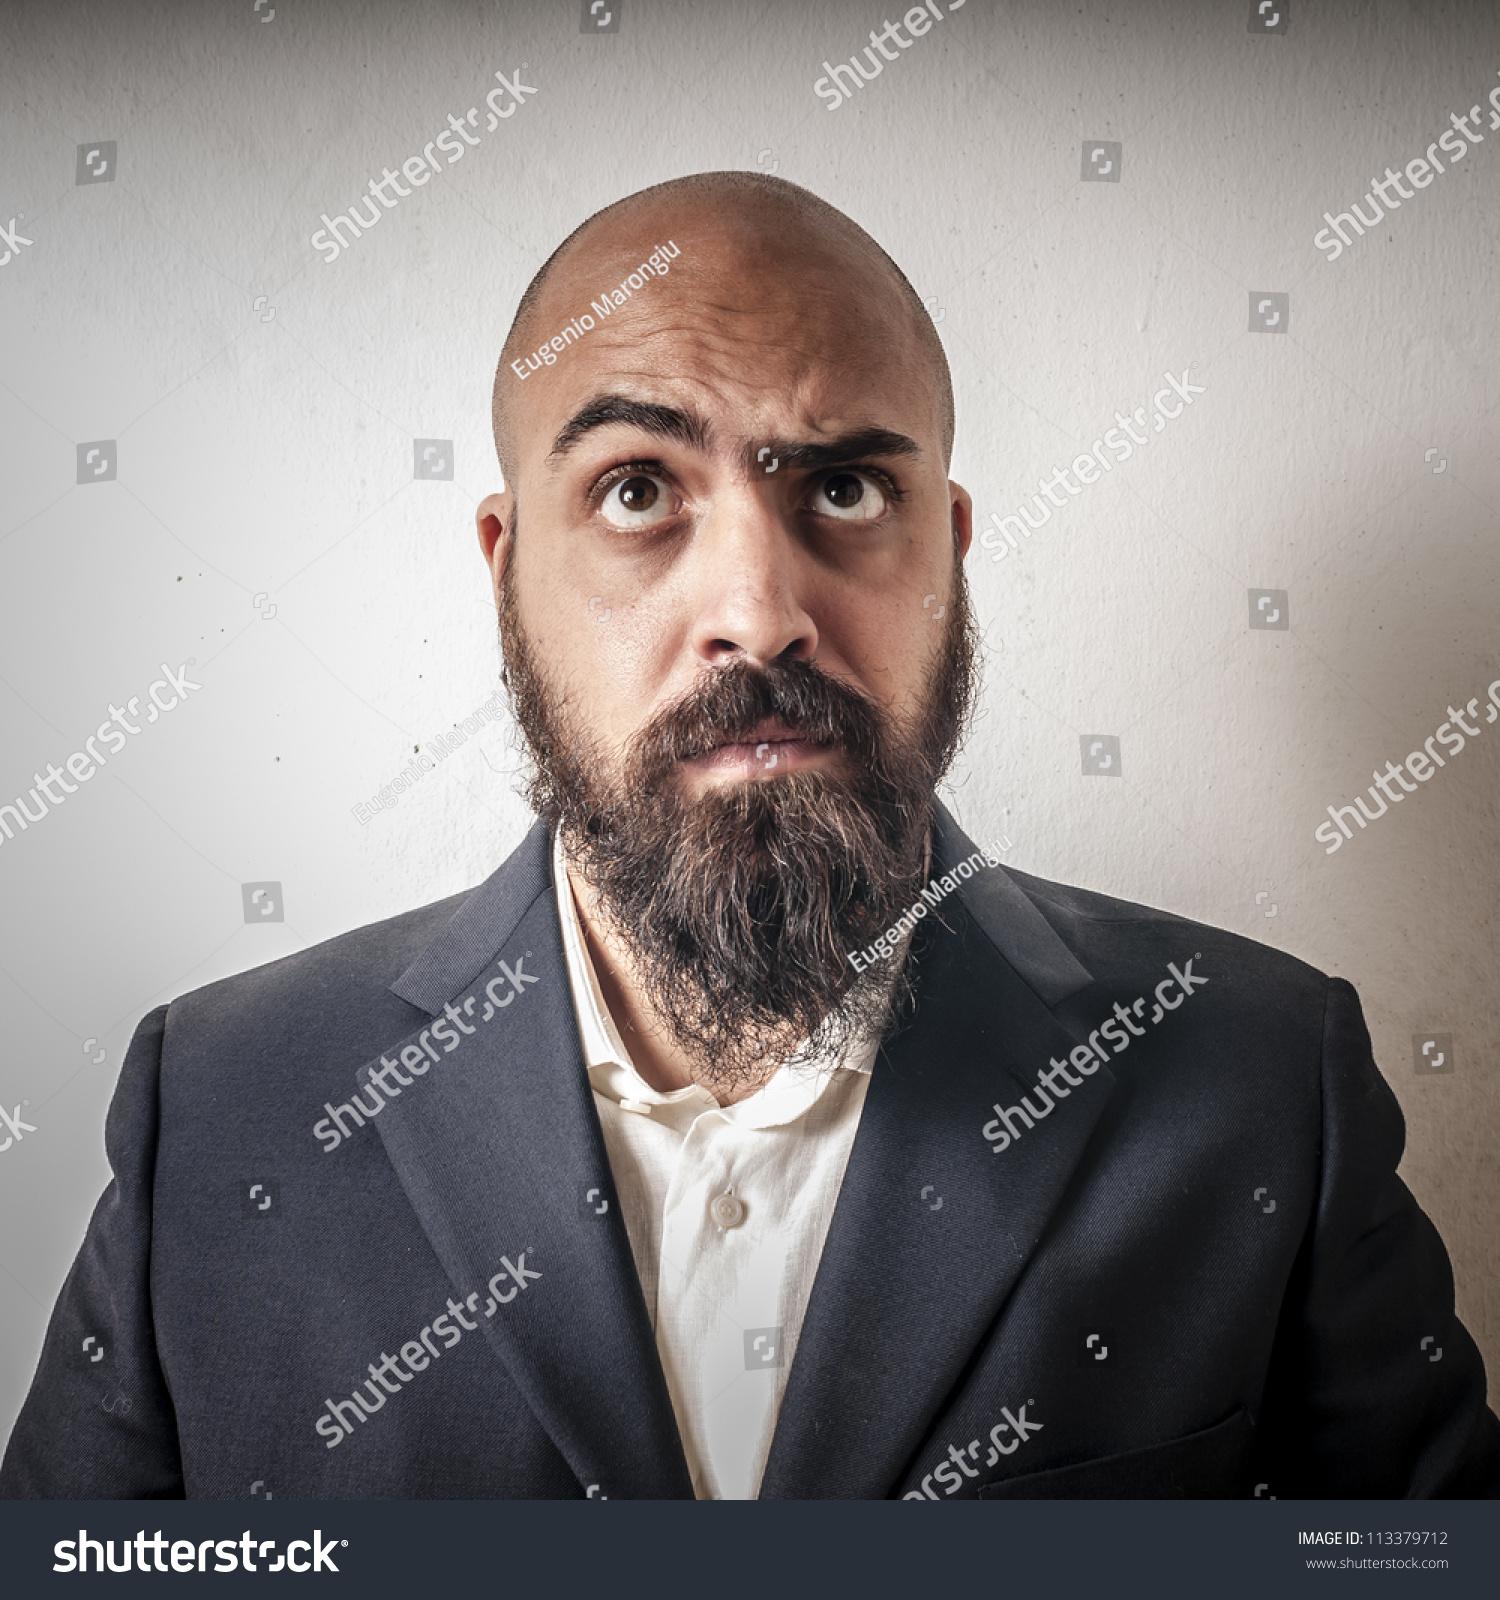 Remarkable Man Suit Beard Strange Expressions On Stock Photo 113379712 Short Hairstyles Gunalazisus